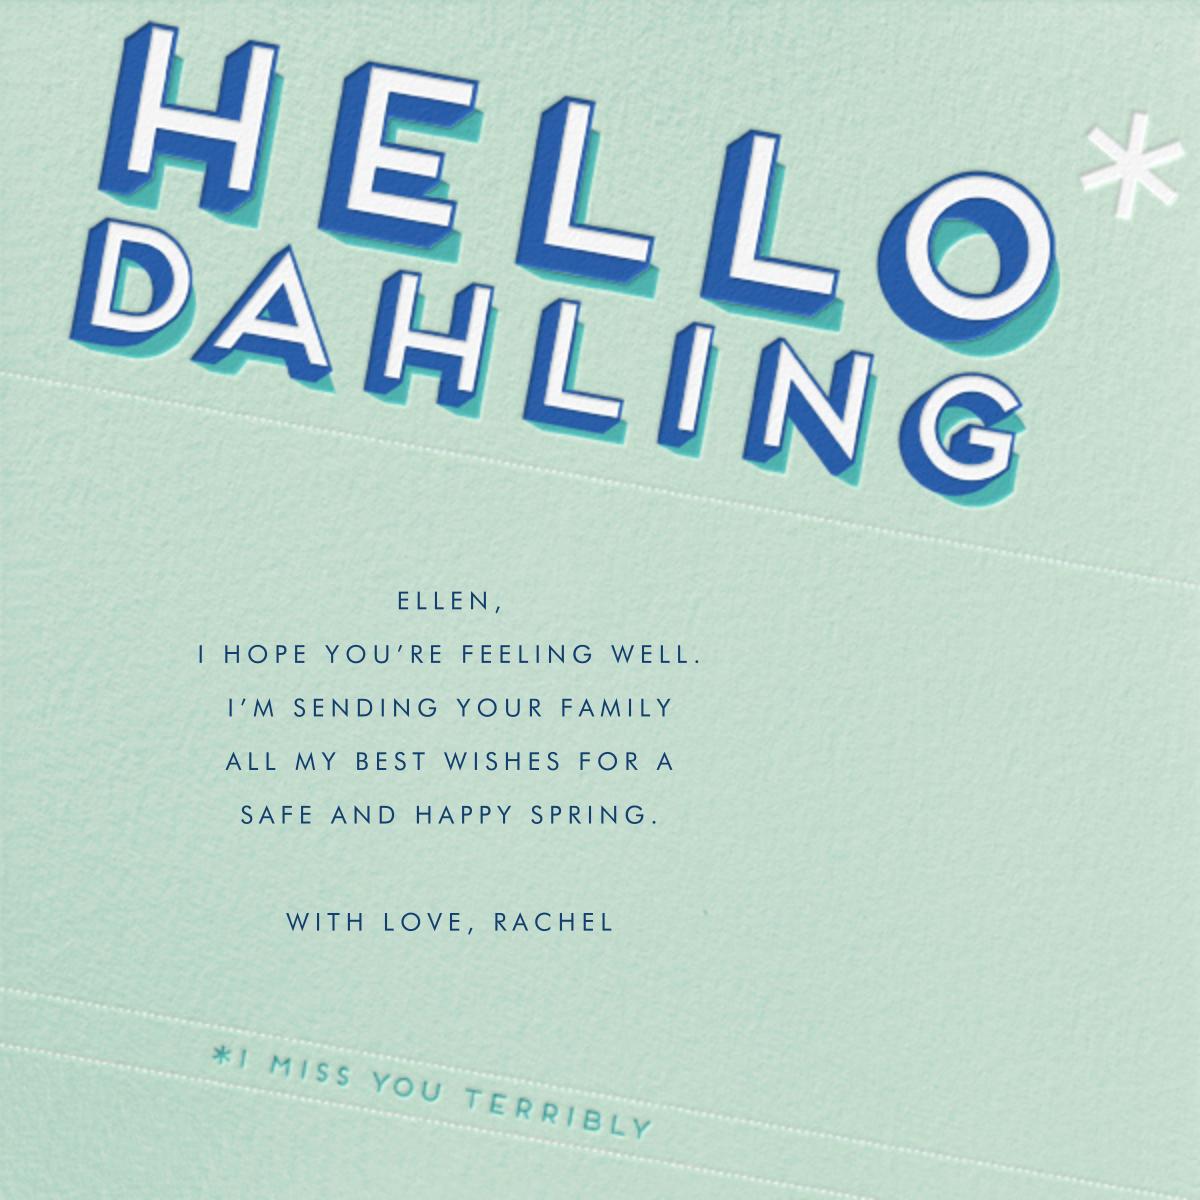 Hello Dahling - Paperless Post